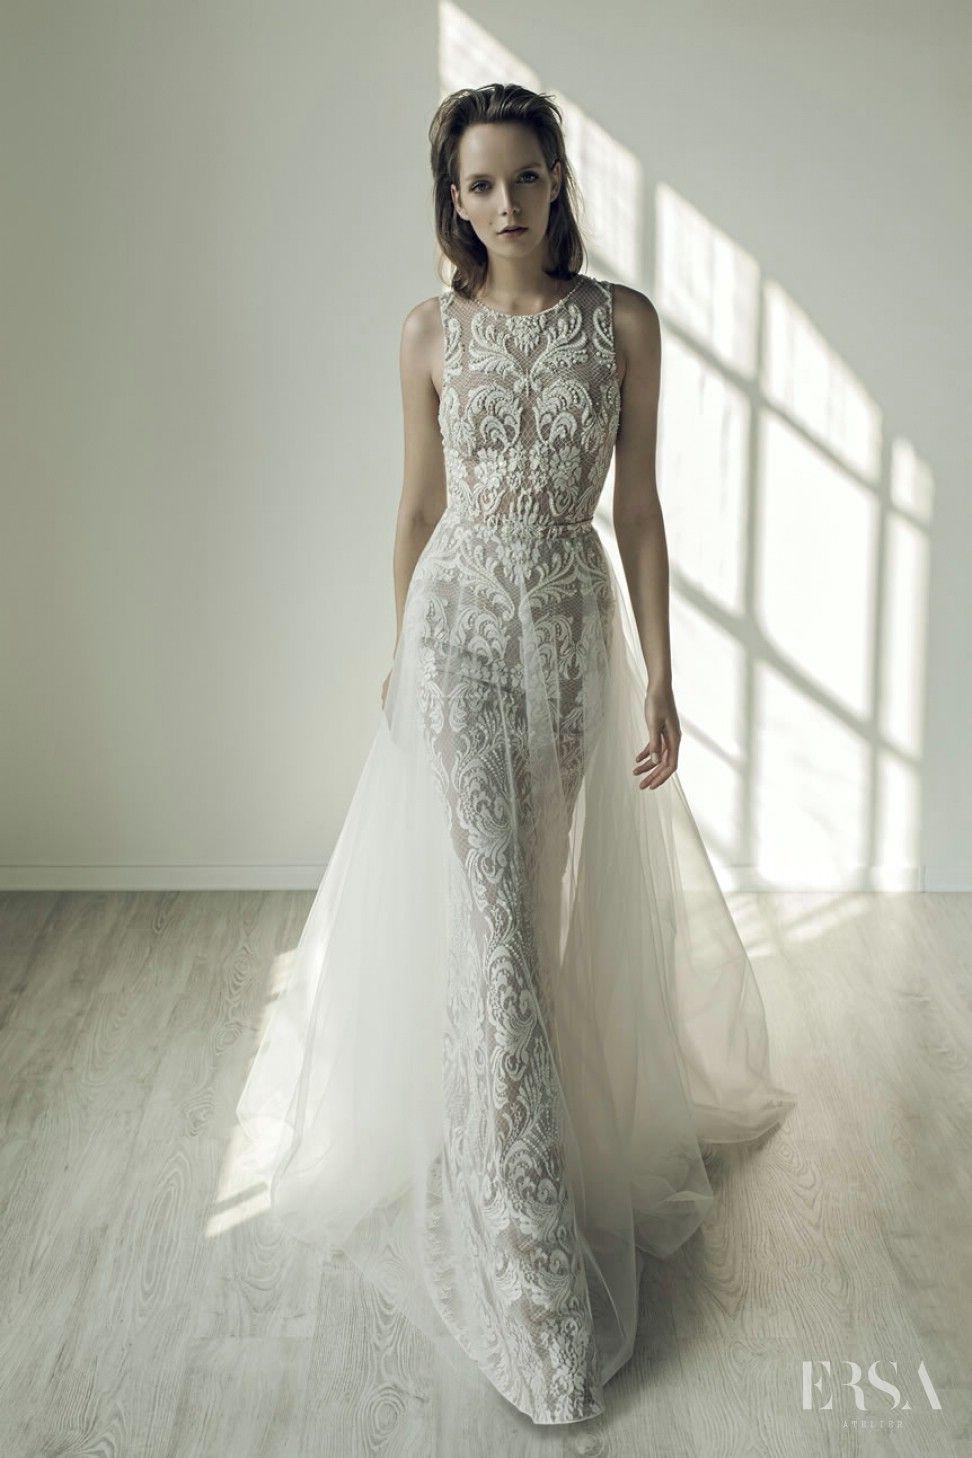 Ersa Atelier Wedding Collection Evening Dress Noelle